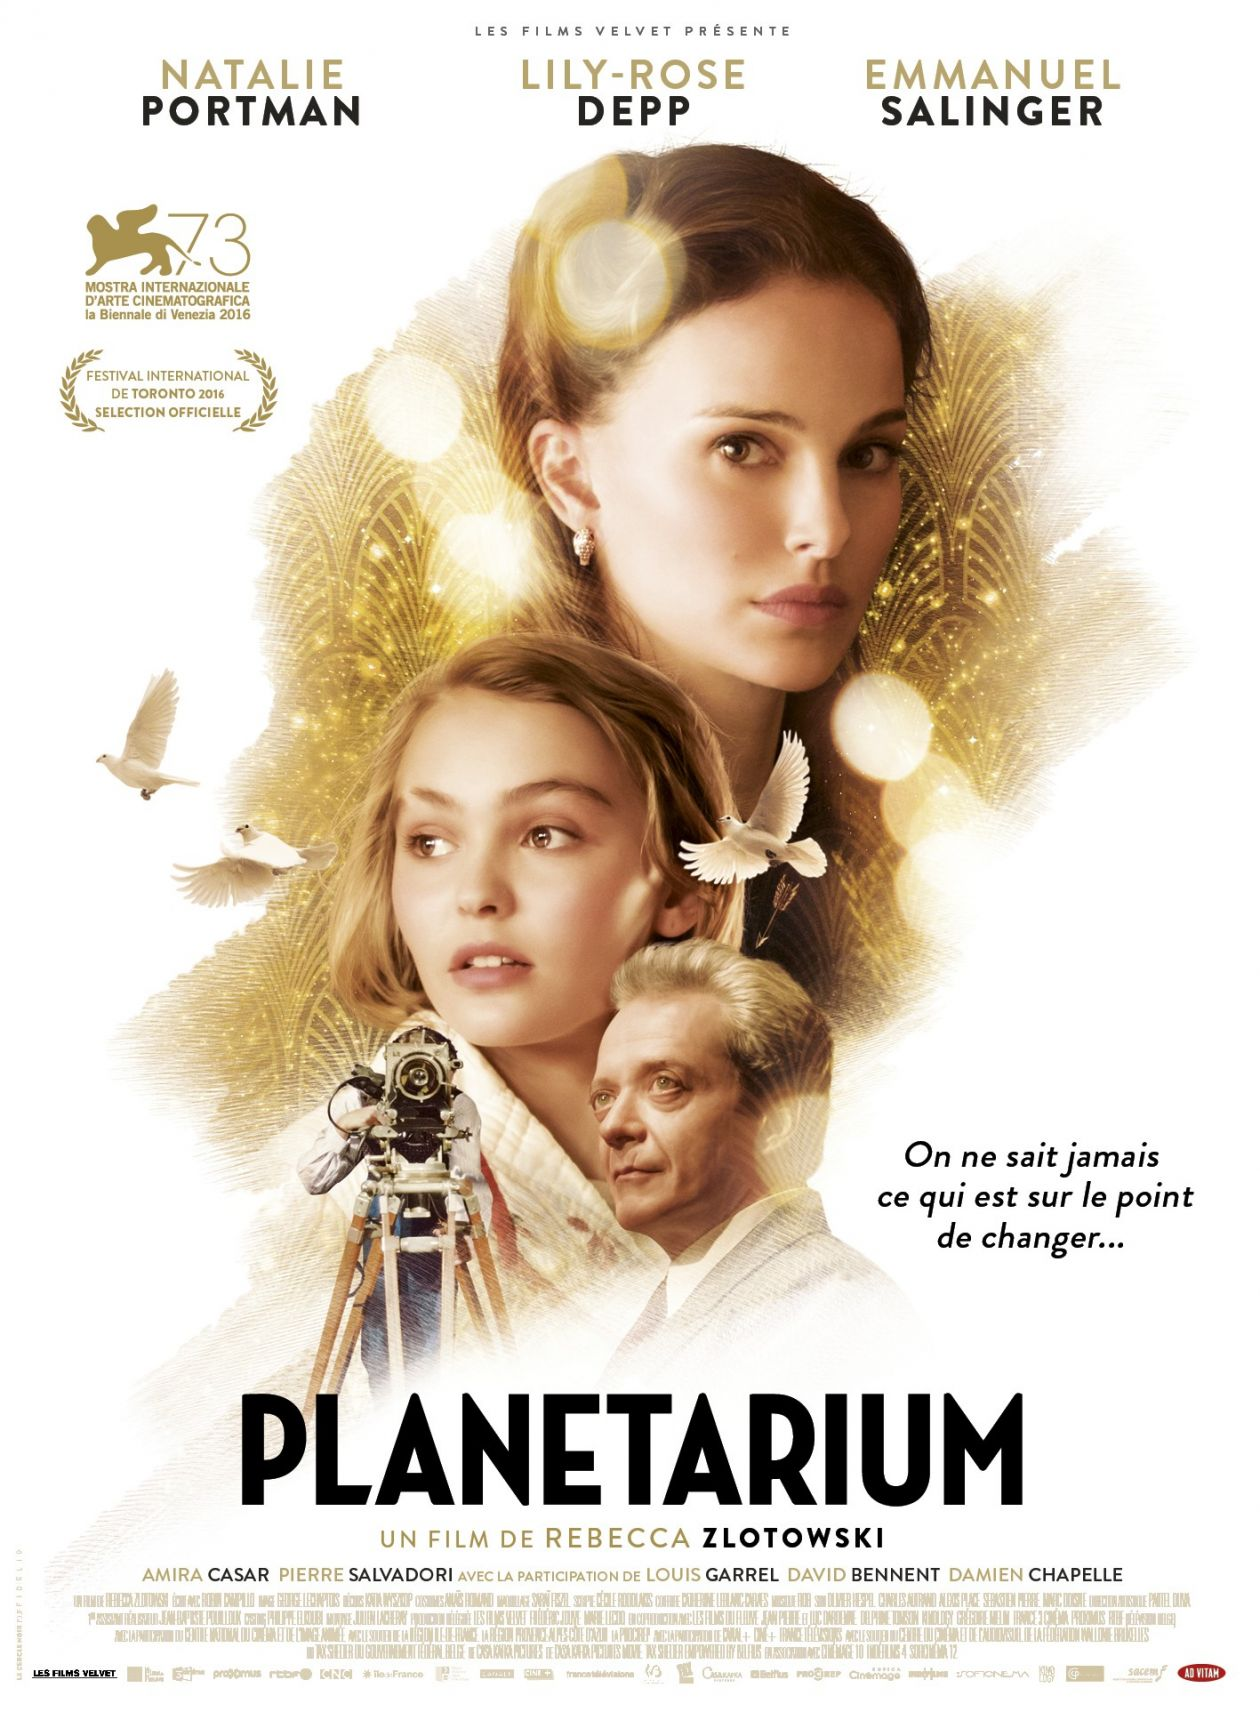 Lily-Rose Depp / Natalie Portman | Planetarium / Rebecca Zlotowski 2016 Movie Poster / Affiche du film